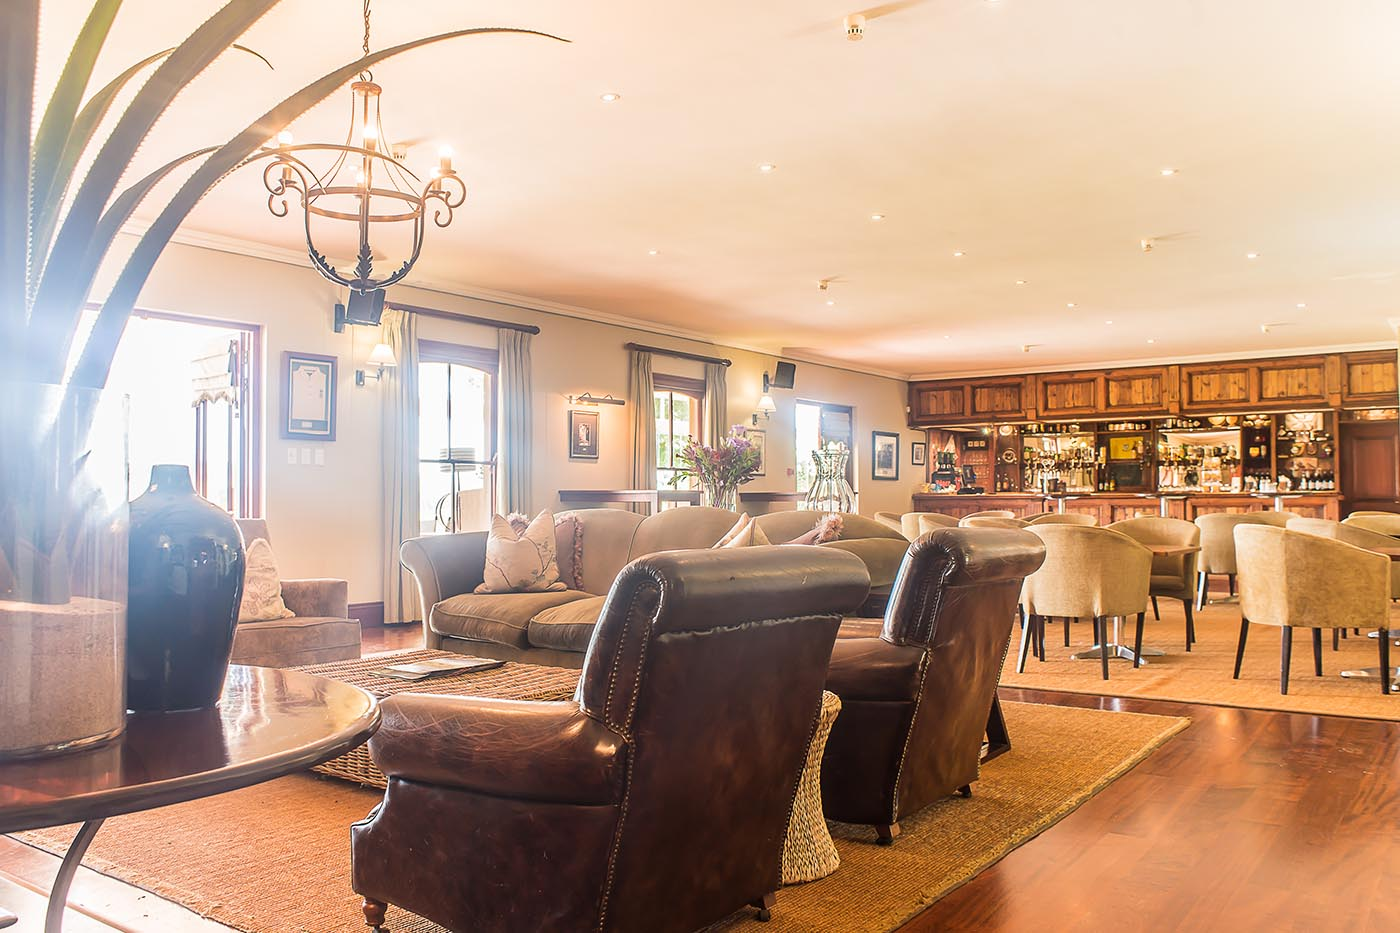 homeowners-gowrie-club-house-golf-lodge-property-midlands-drakensberg-Nottingham-Road